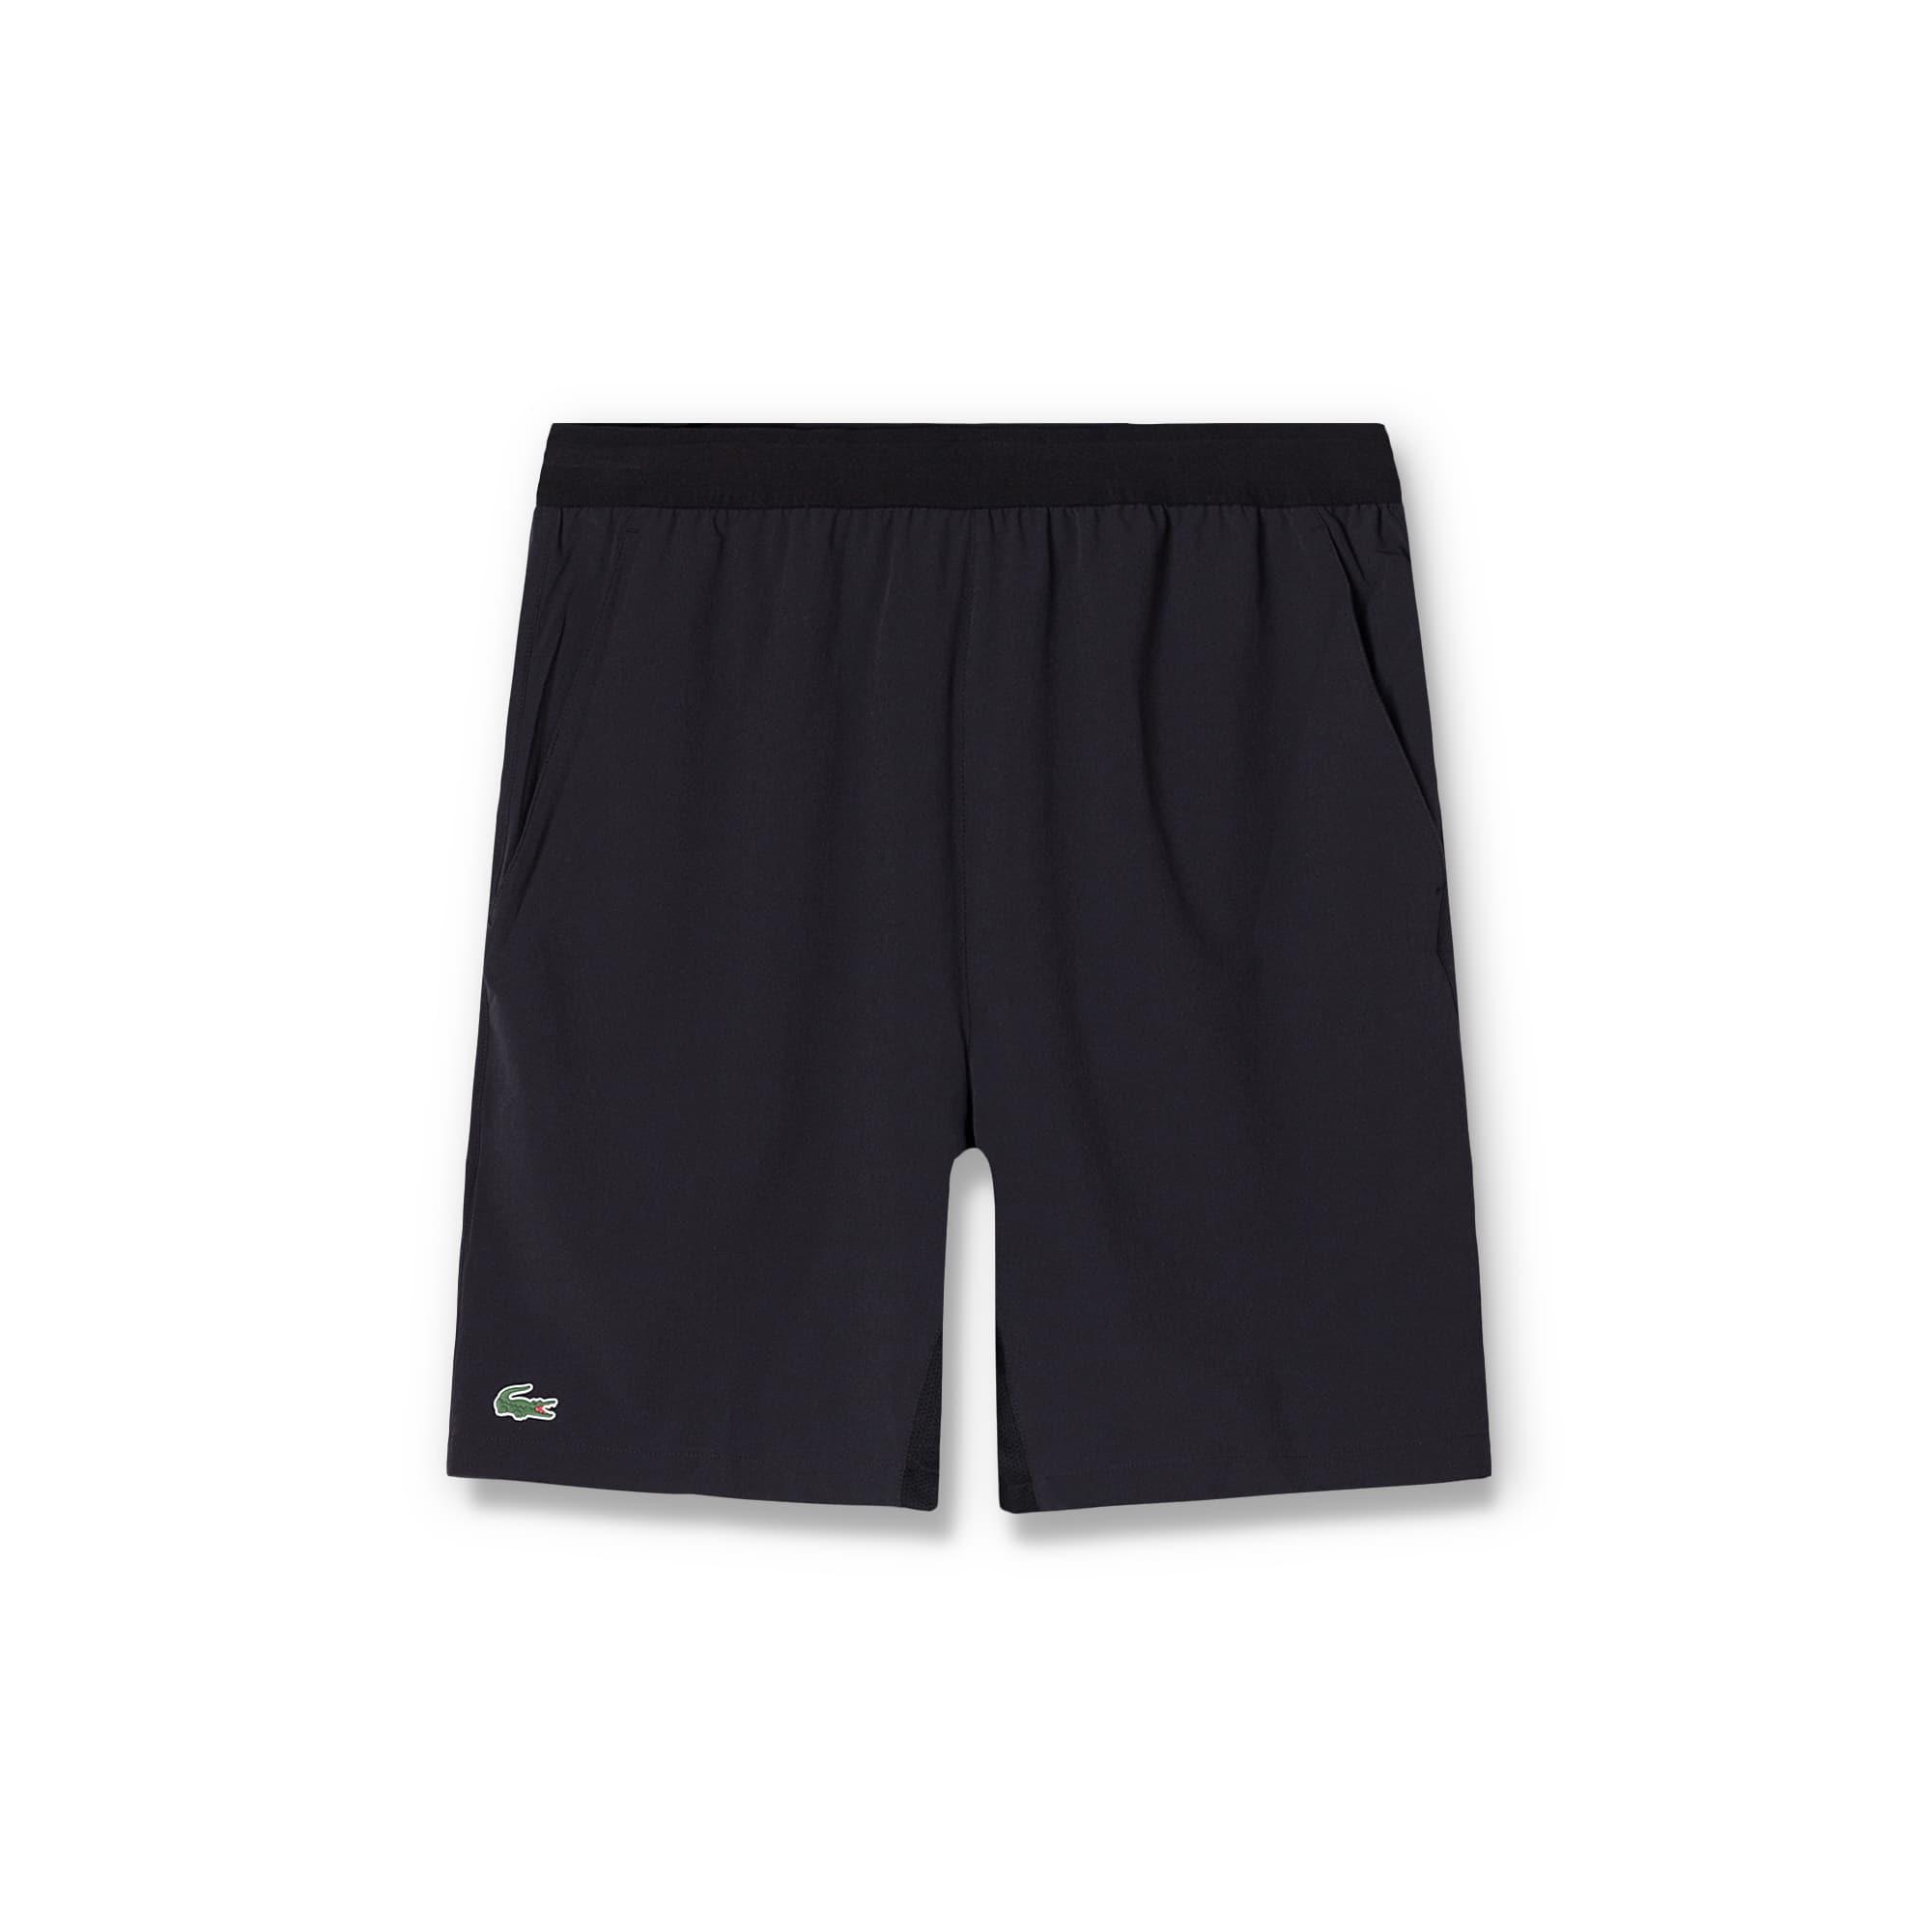 Lacoste SPORT系列男士网球弹力短裤